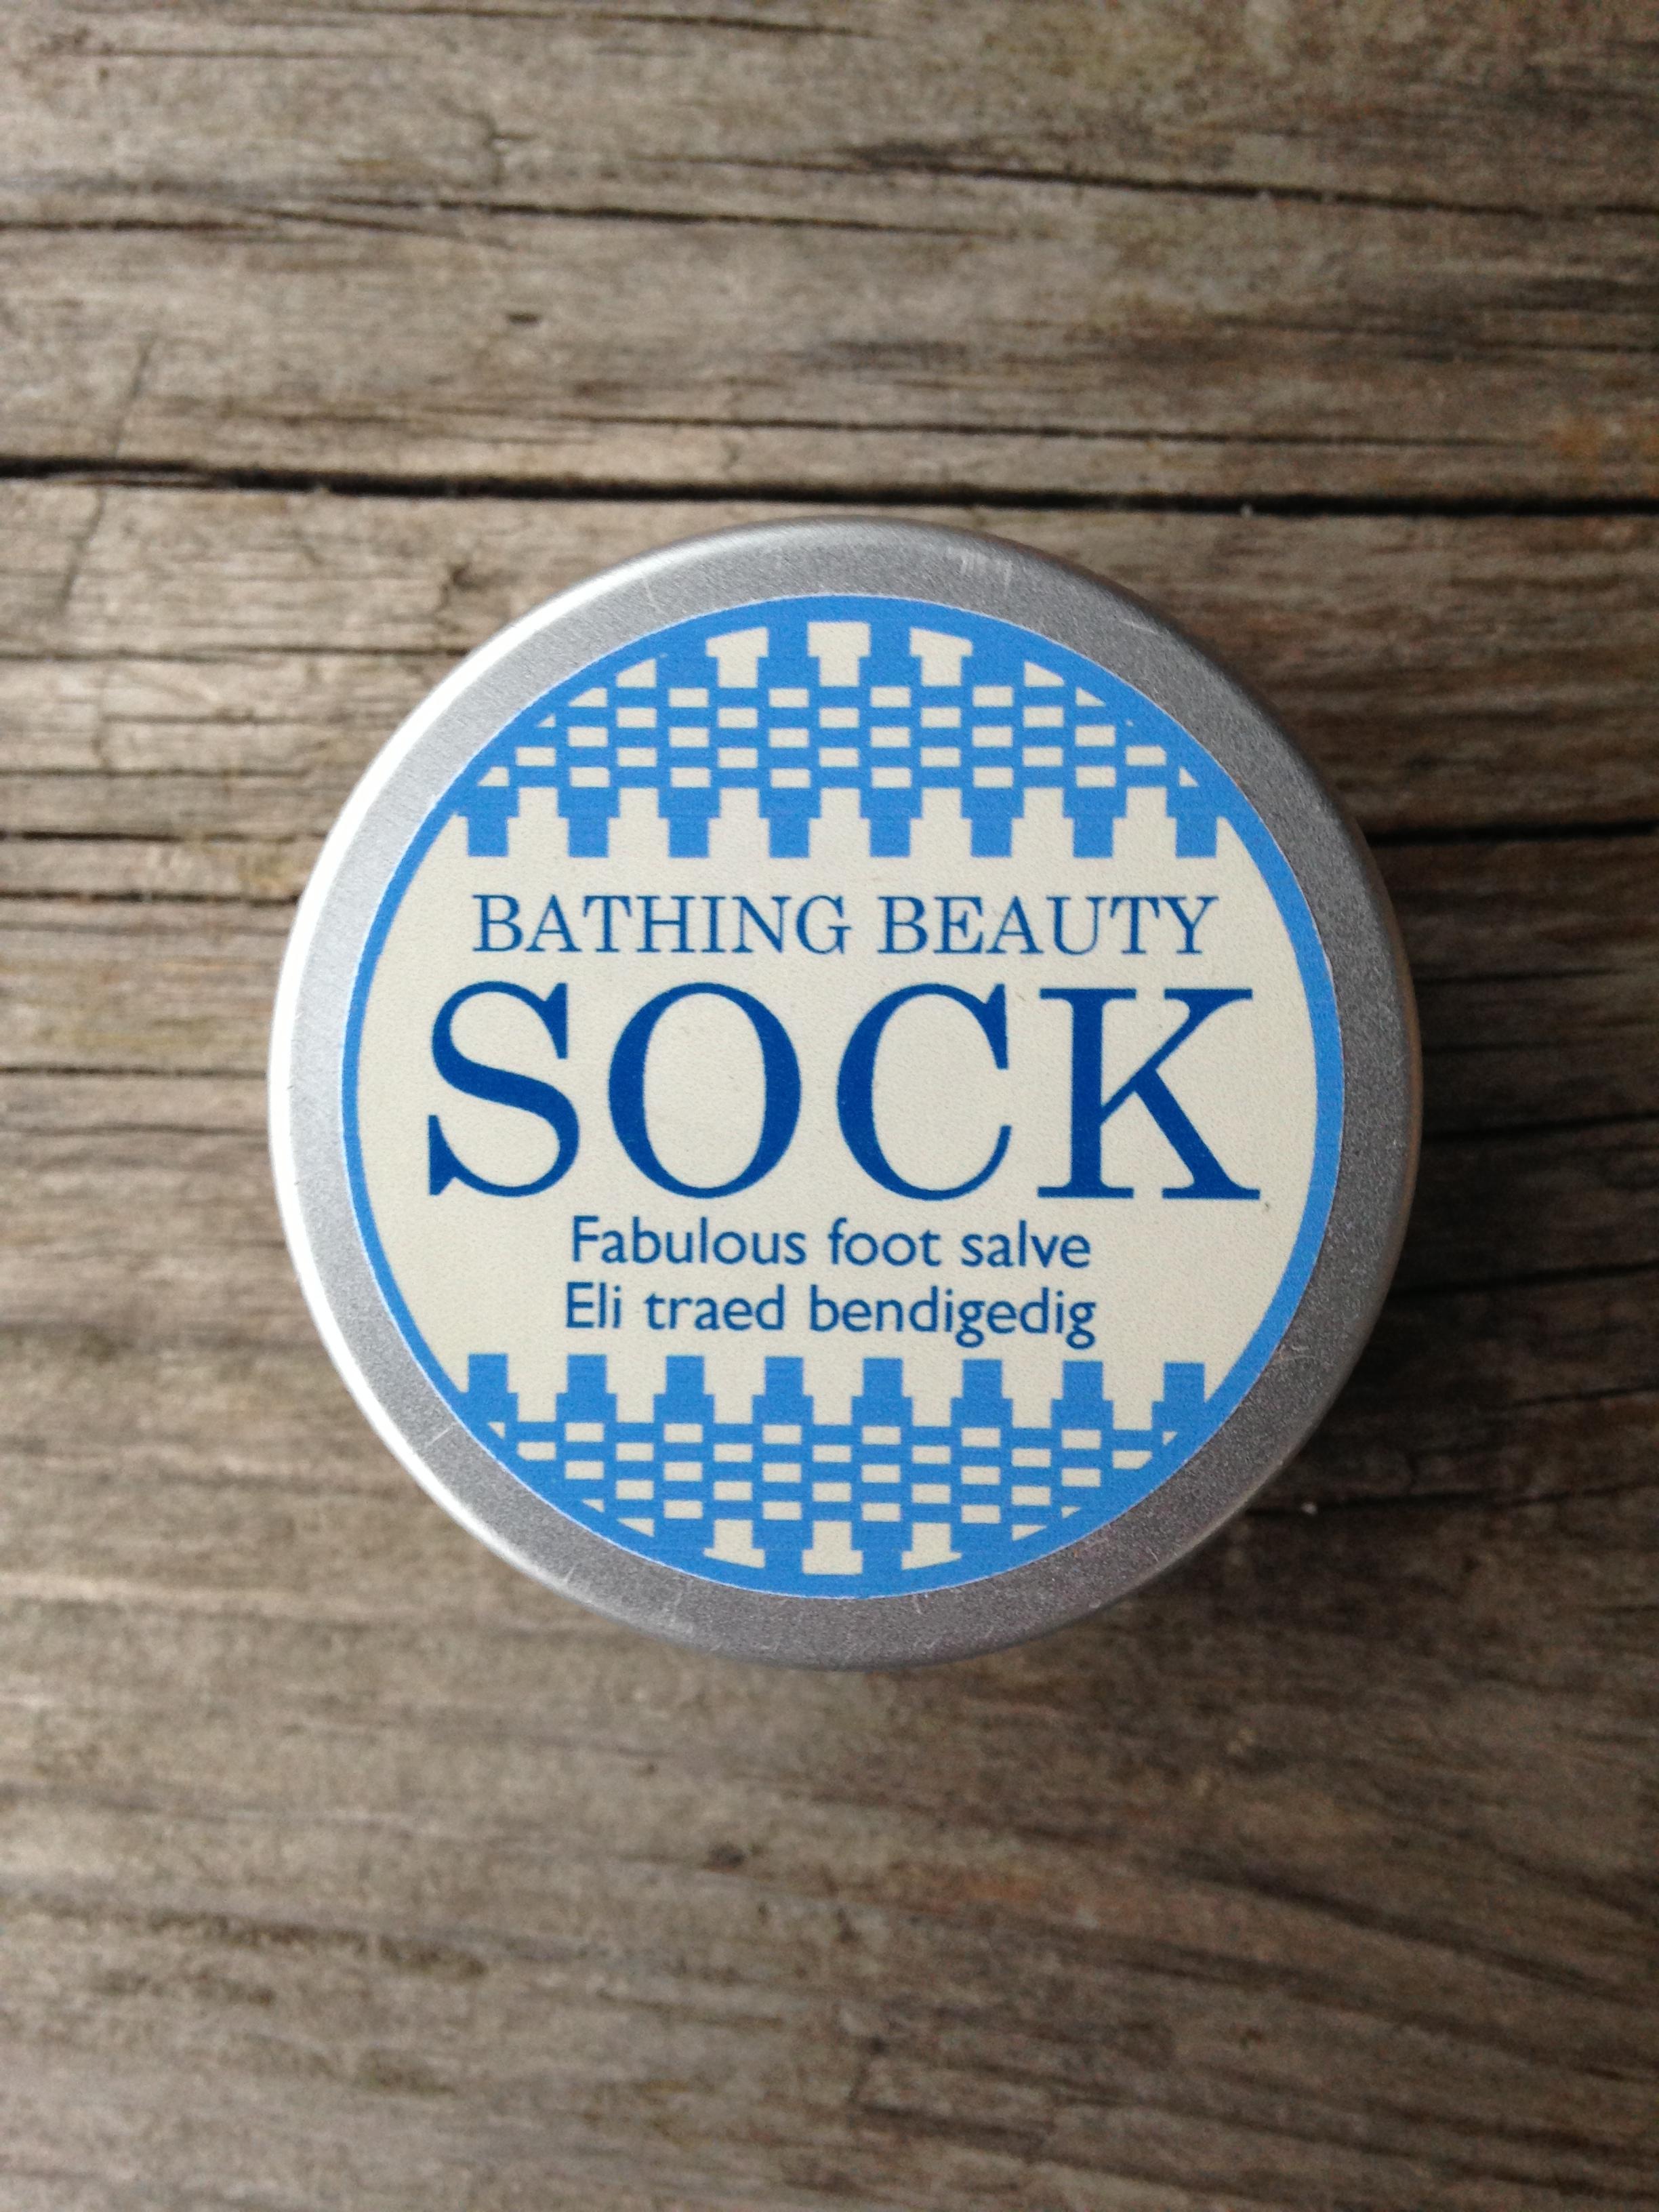 supernourishing foot salve with skin healing, moisturising and odour control properties